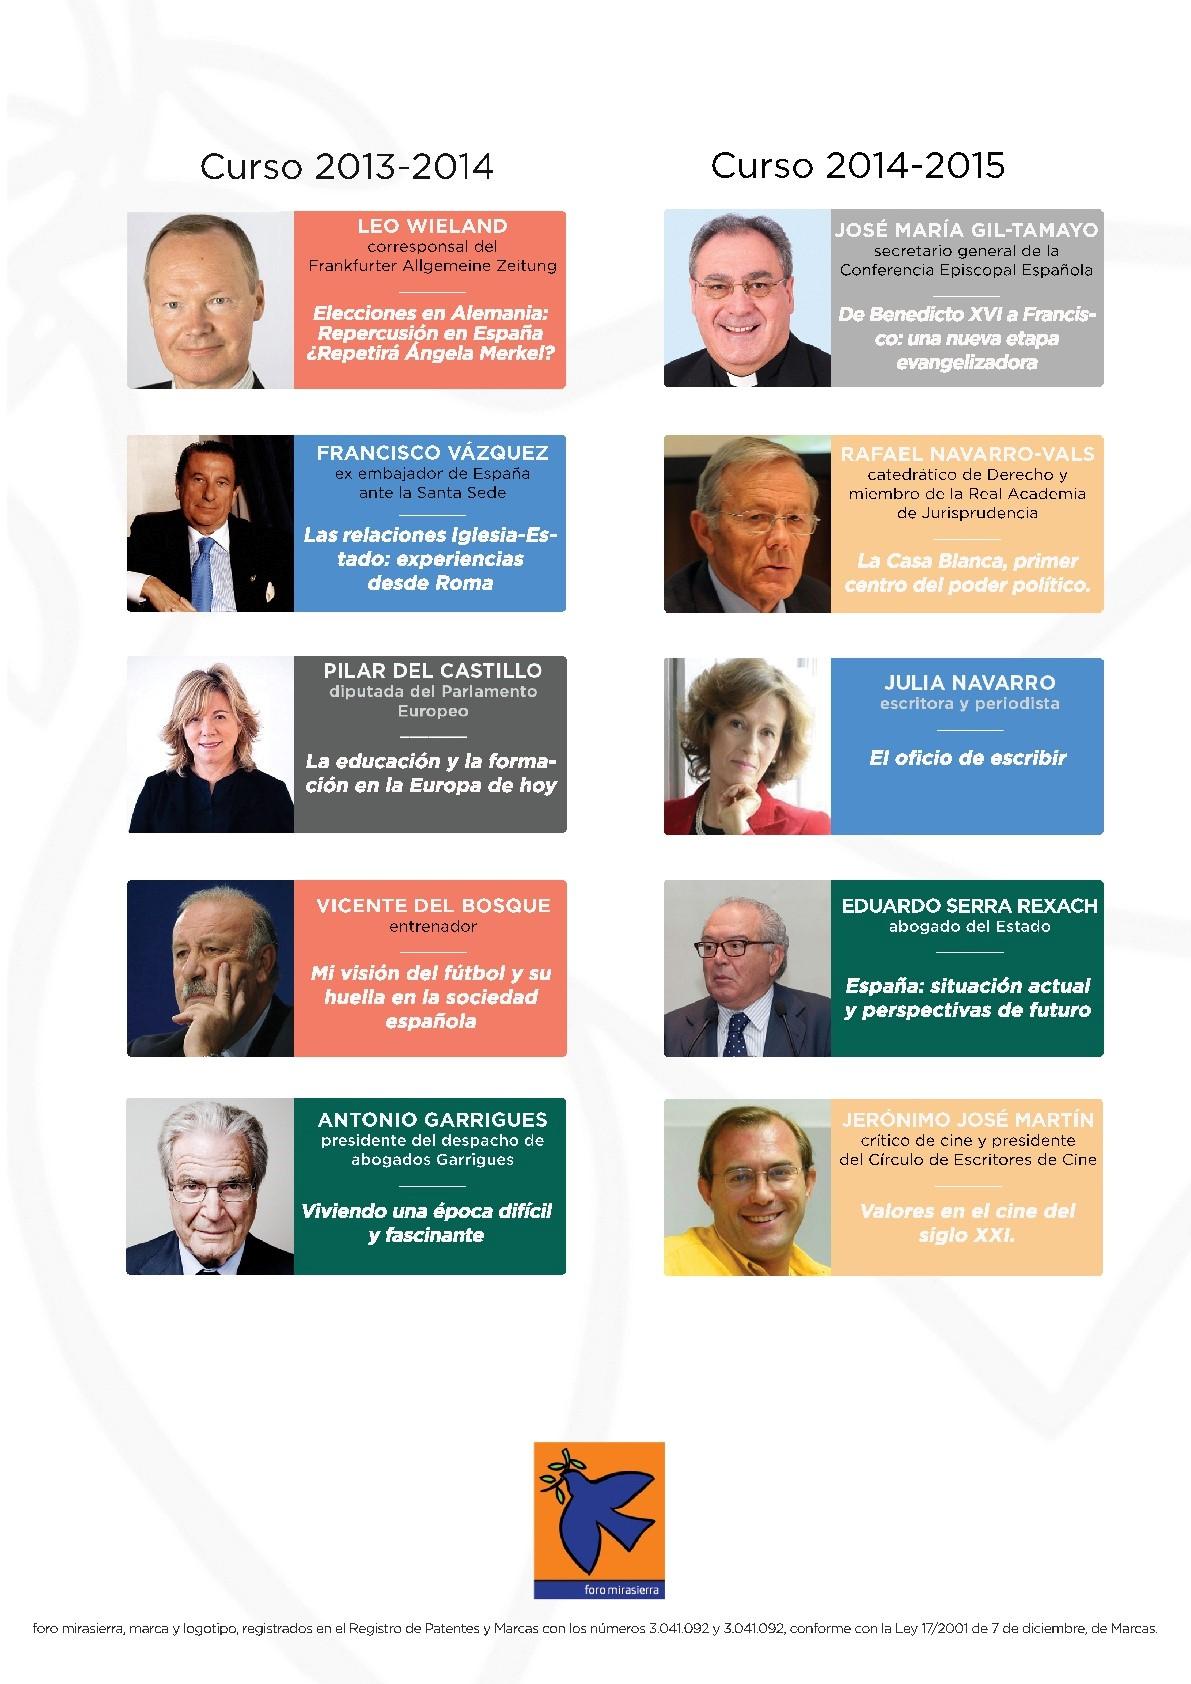 Foro Mirasierra -Ponentes-2011-2015